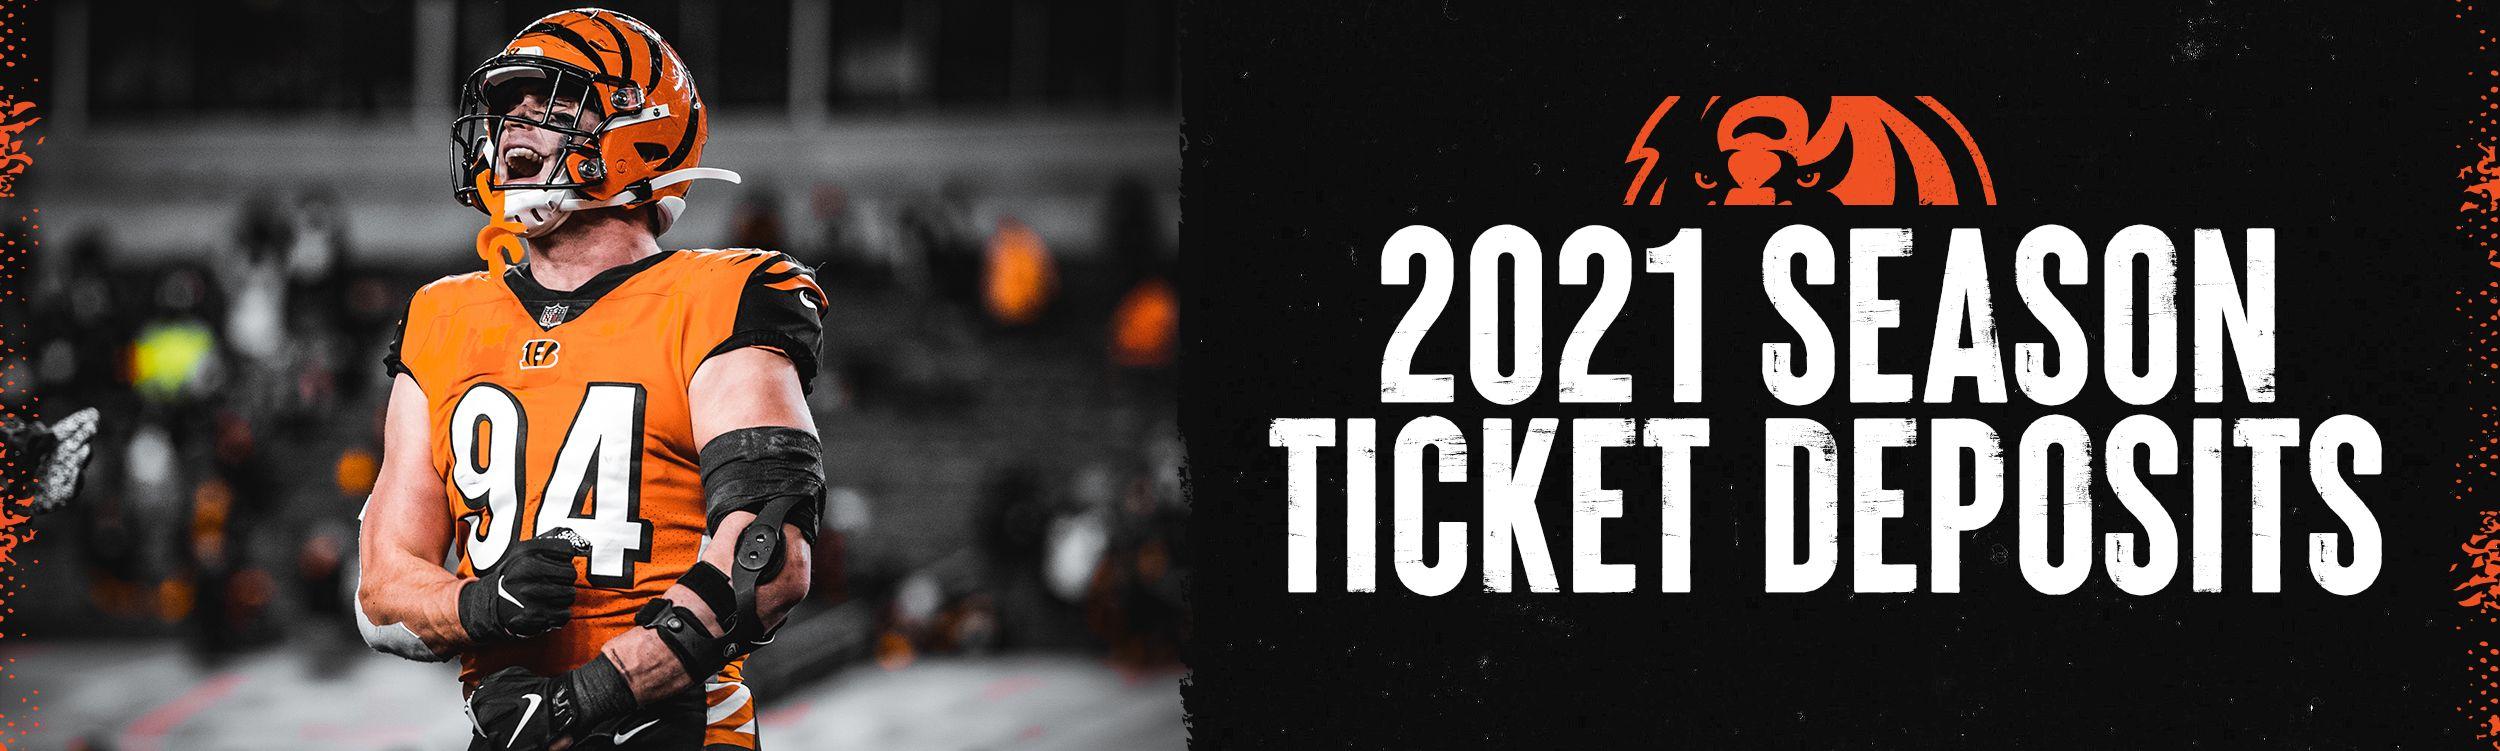 210105-season-ticket-deposits-2021-header